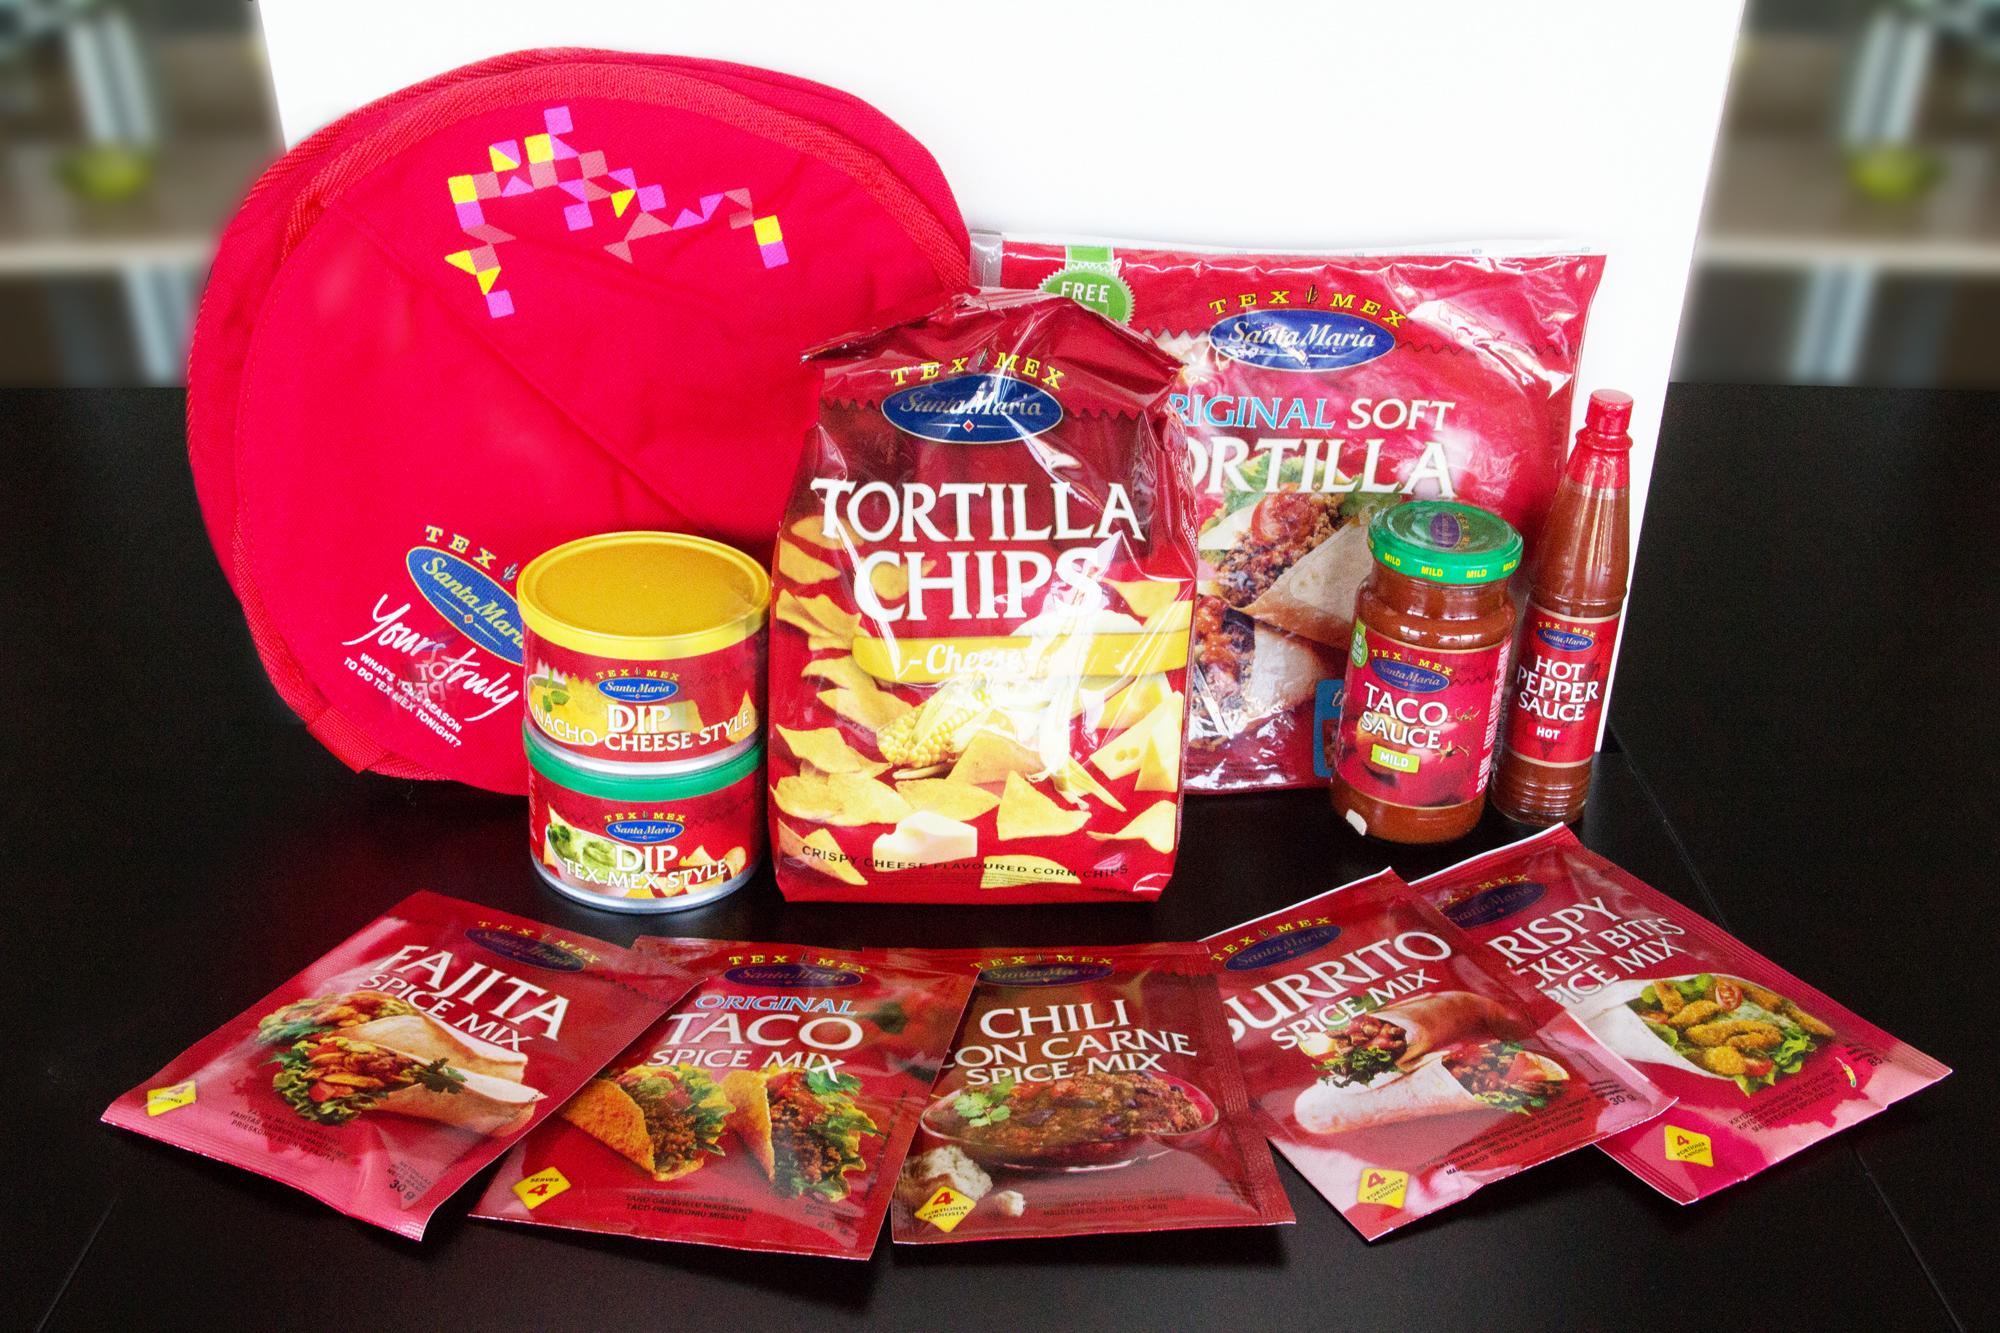 Santa Maria TEX MEX produktų rinkinys